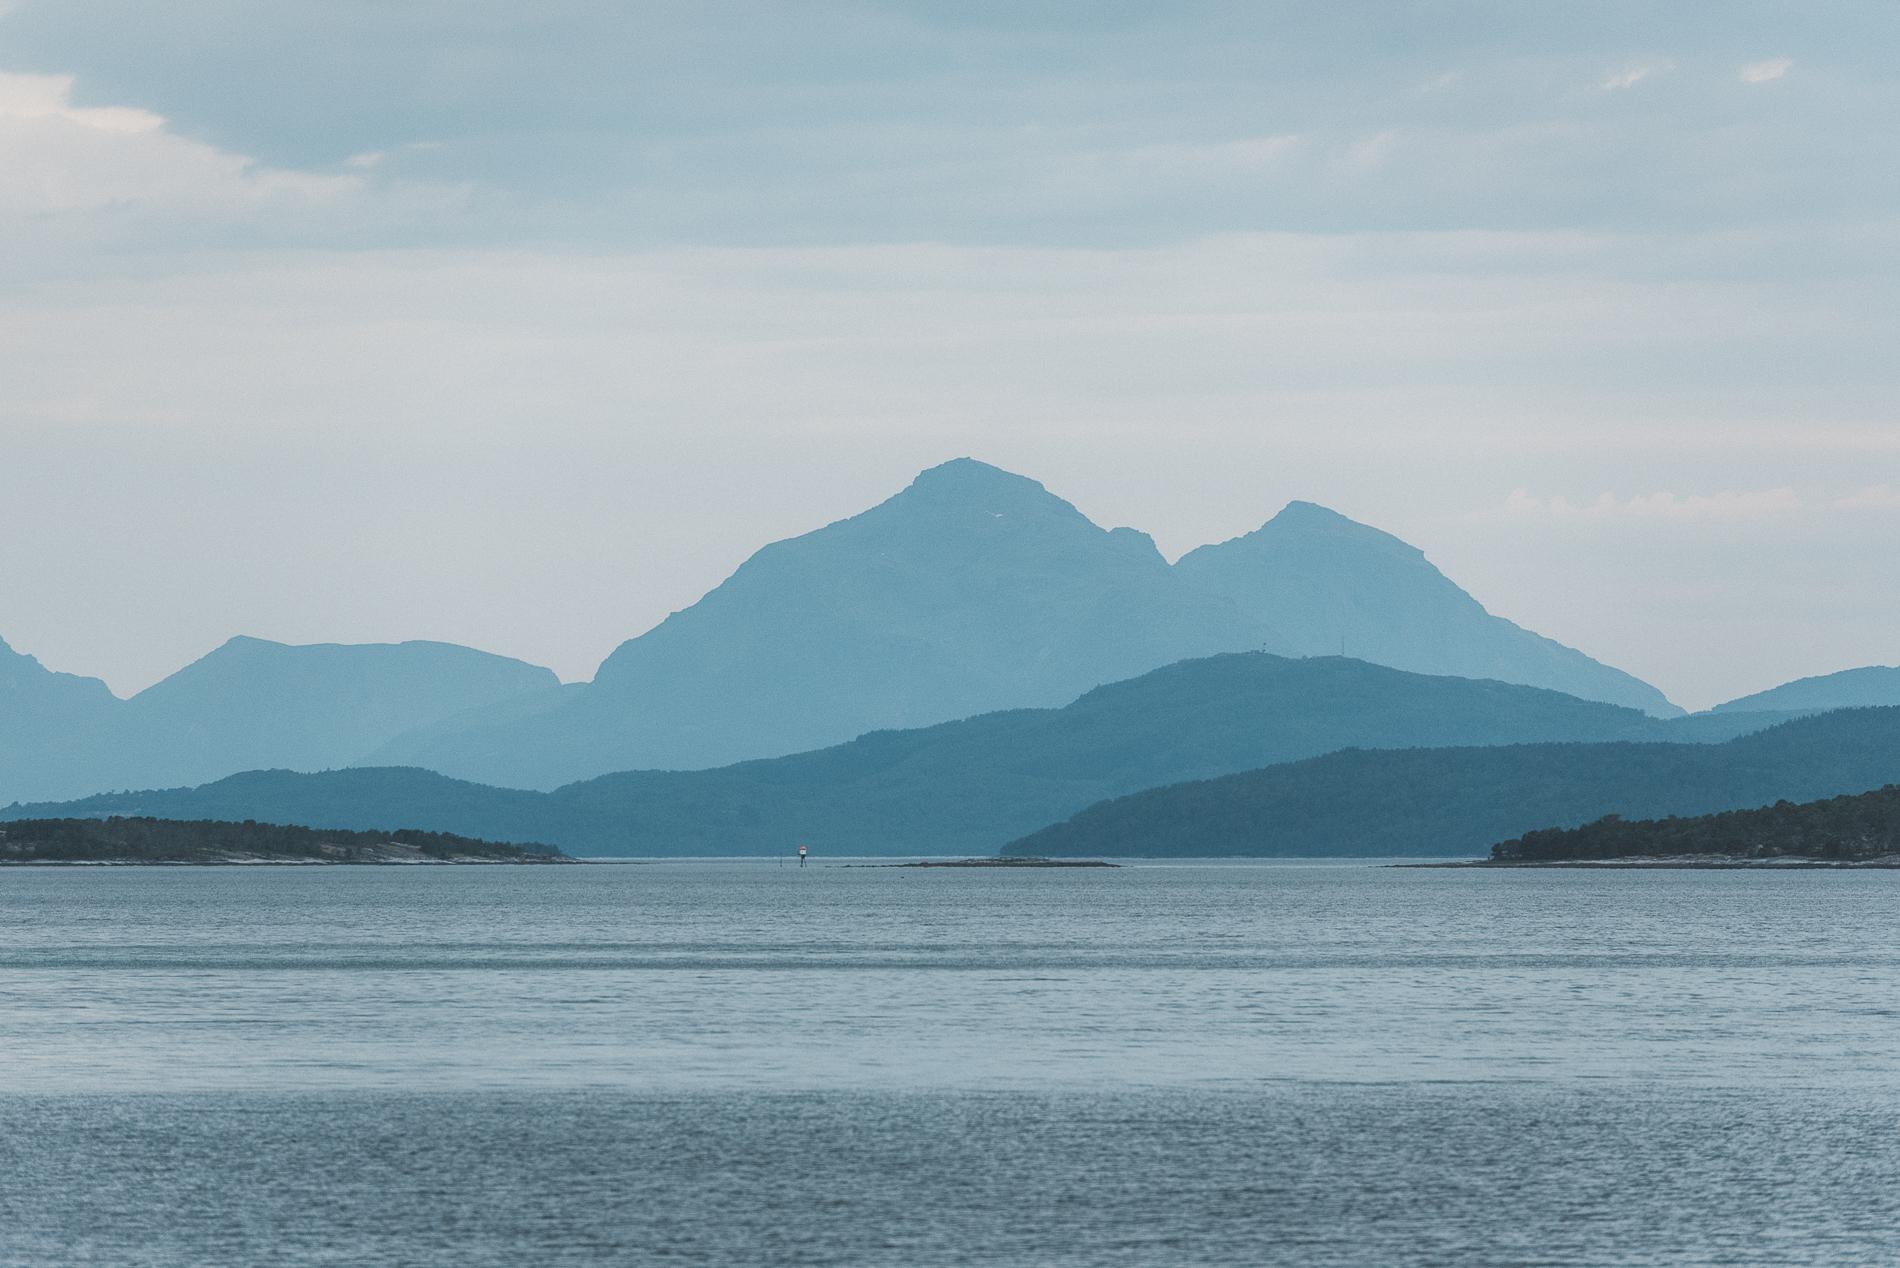 Fjordlines of Blue, Norway